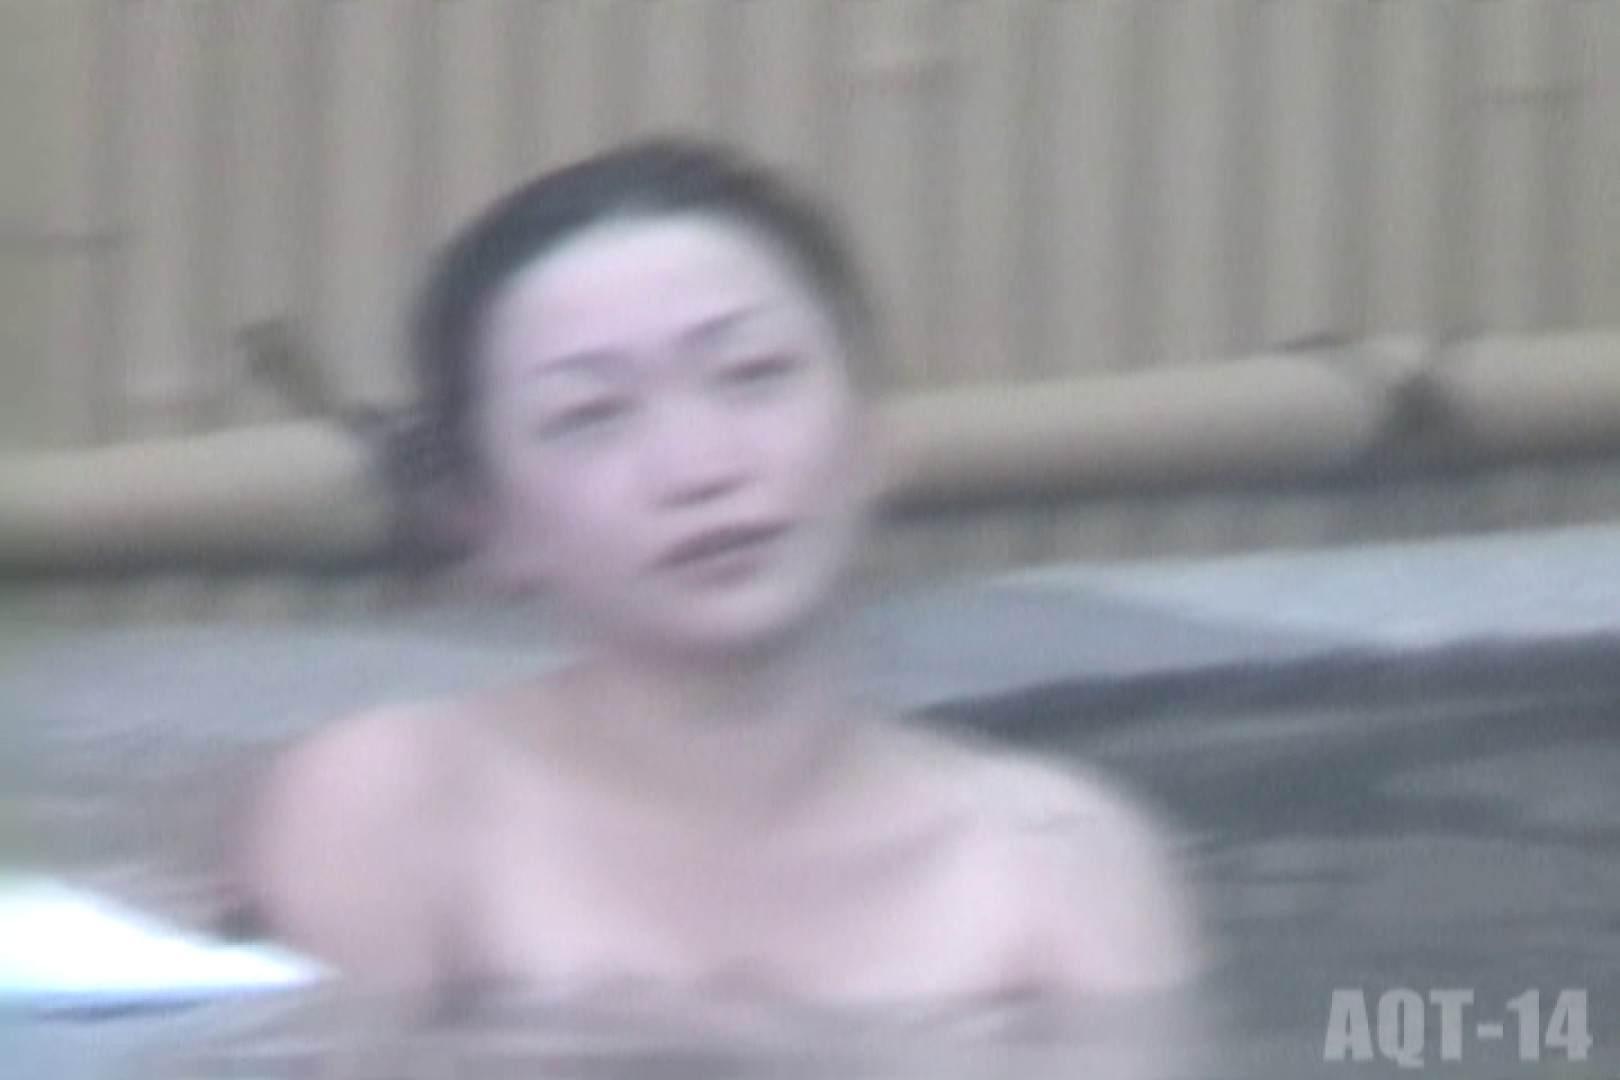 Aquaな露天風呂Vol.826 盗撮 | OLエロ画像  88PICs 22